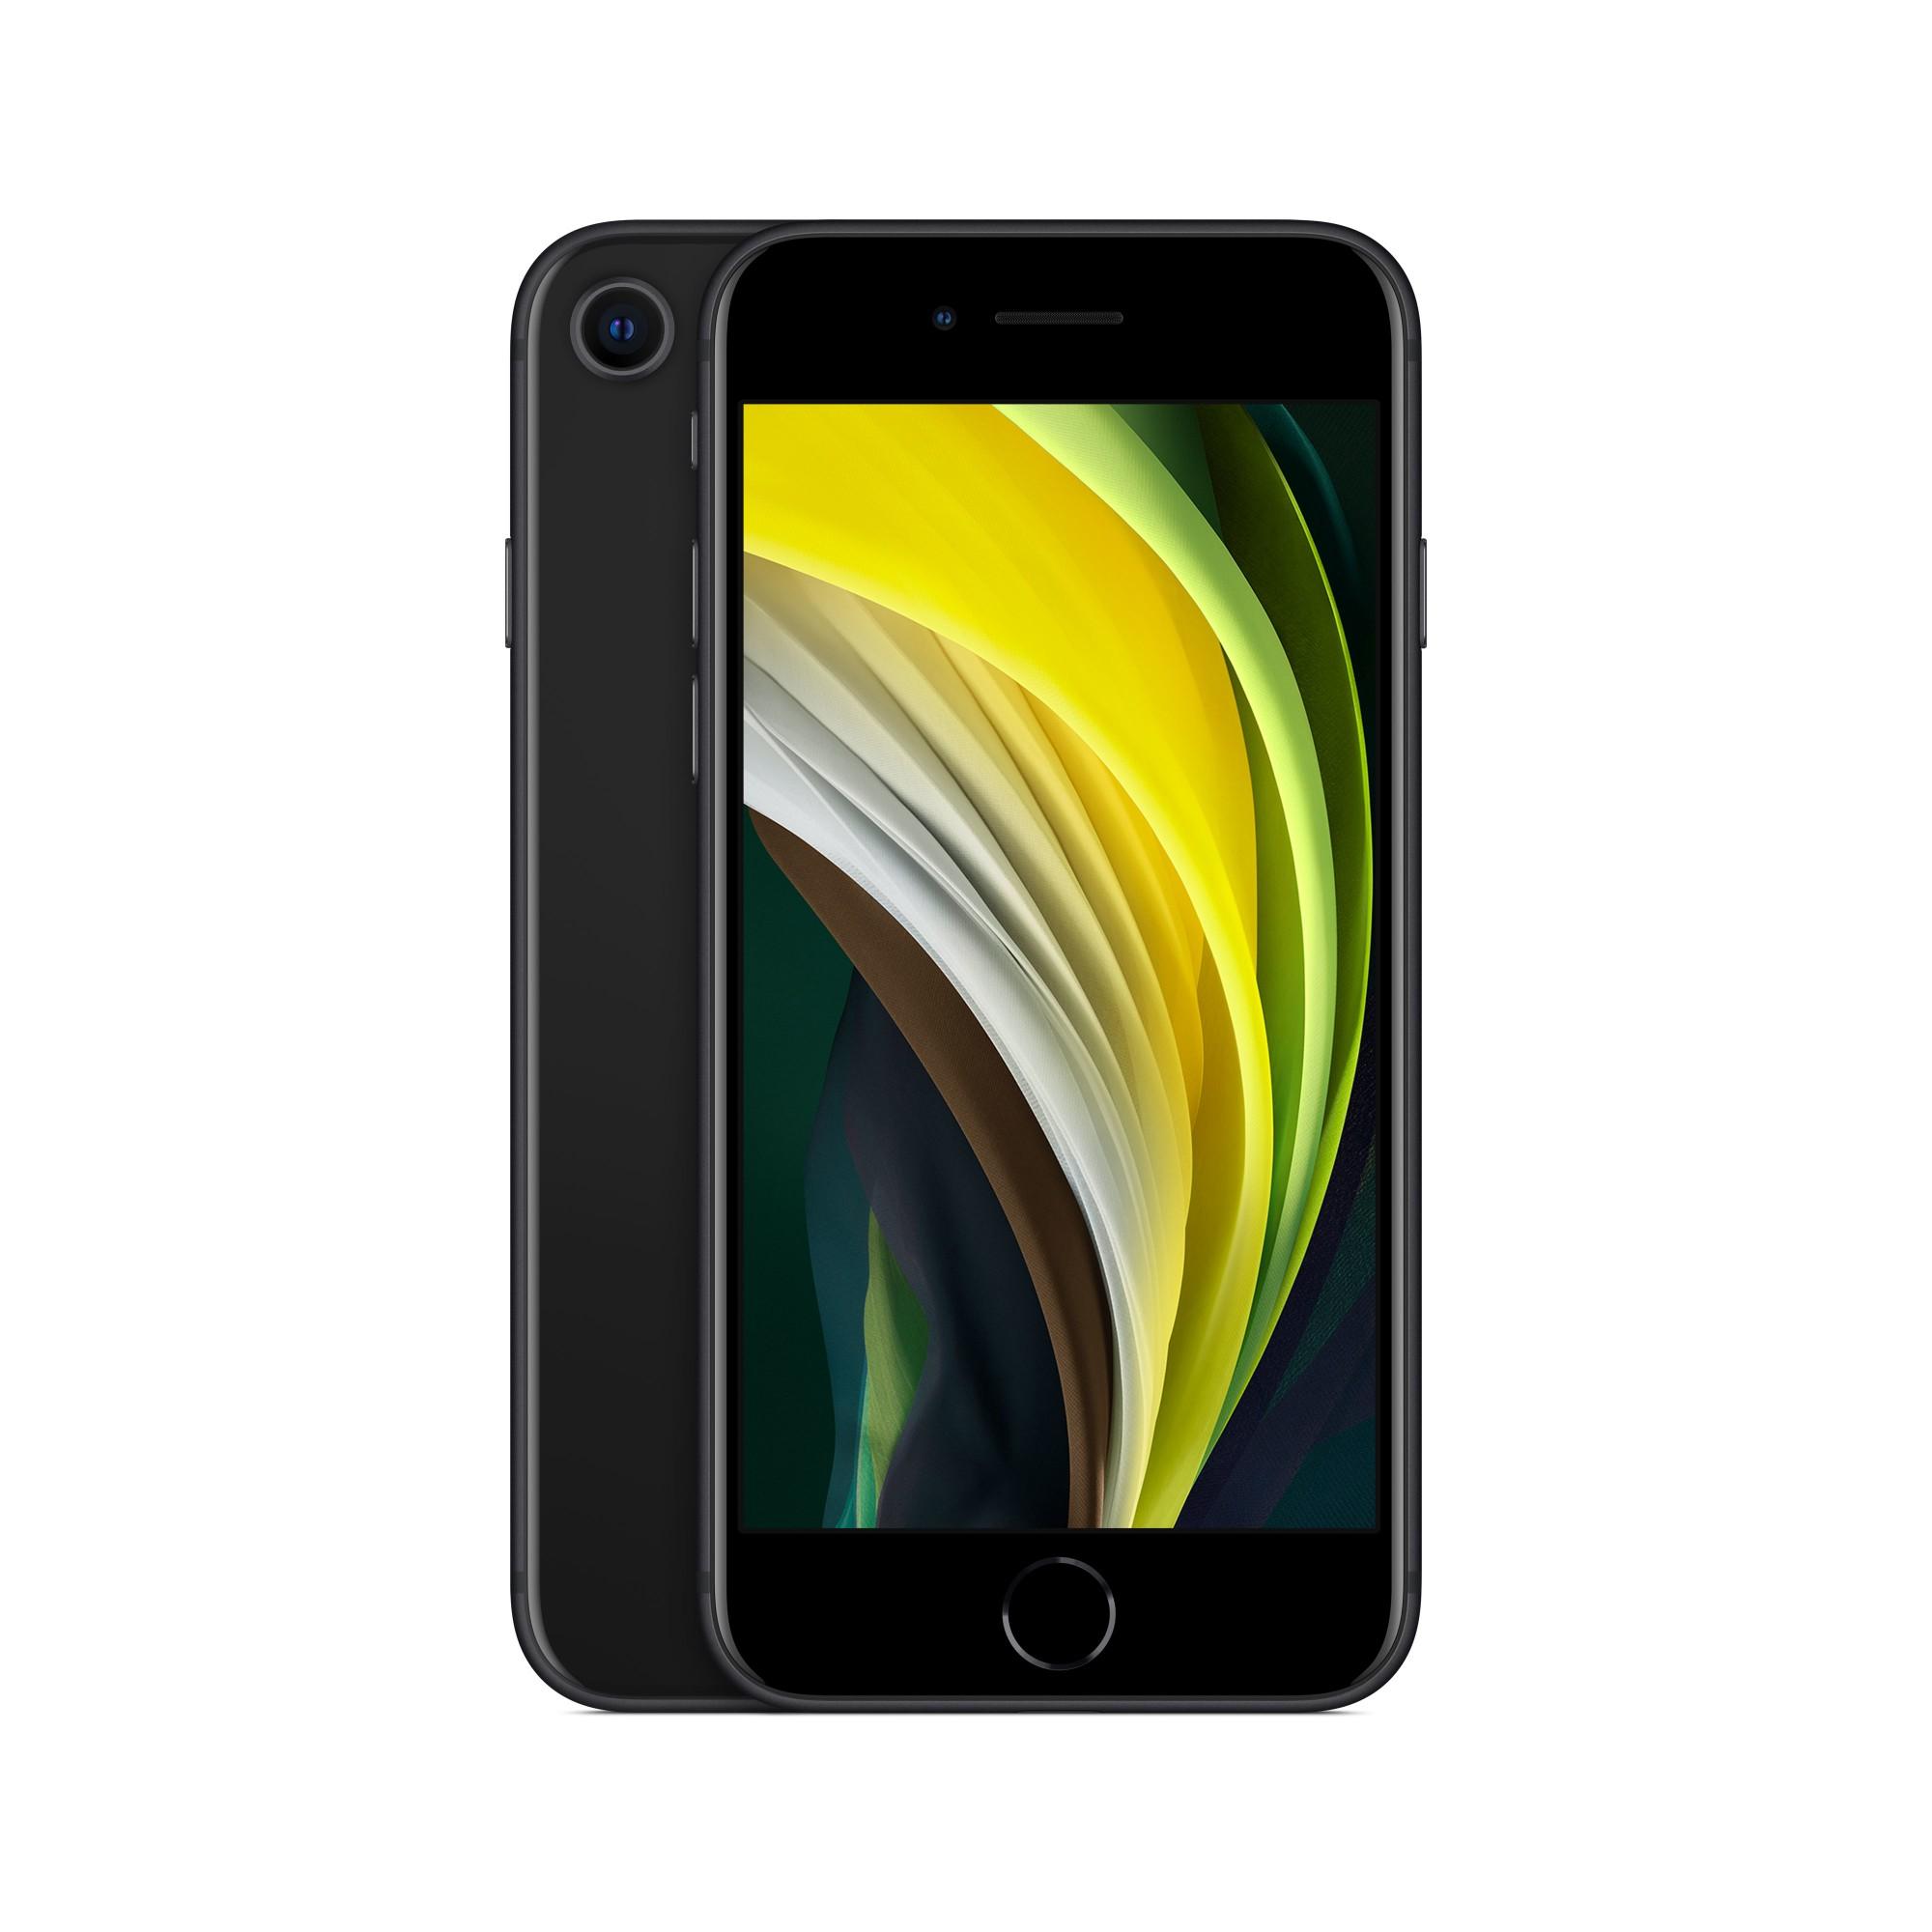 Apple iPhone SE 11.9 cm (4.7